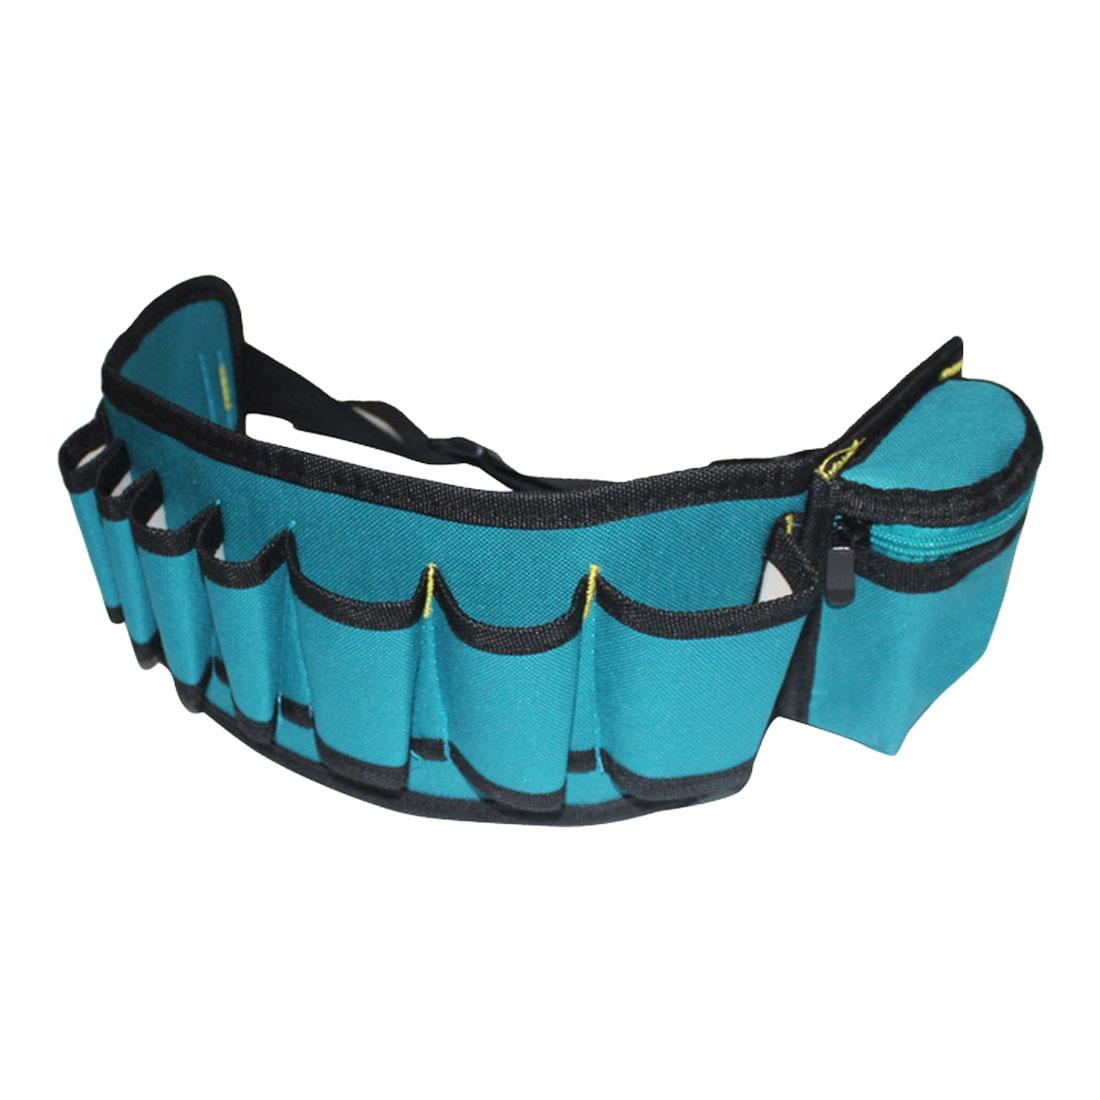 Multi-pockets Tool Bag Waist Pockets Electrician Tool Bag Oganizer Carrying Pouch Tools Bag Belt Waist Pocket Case